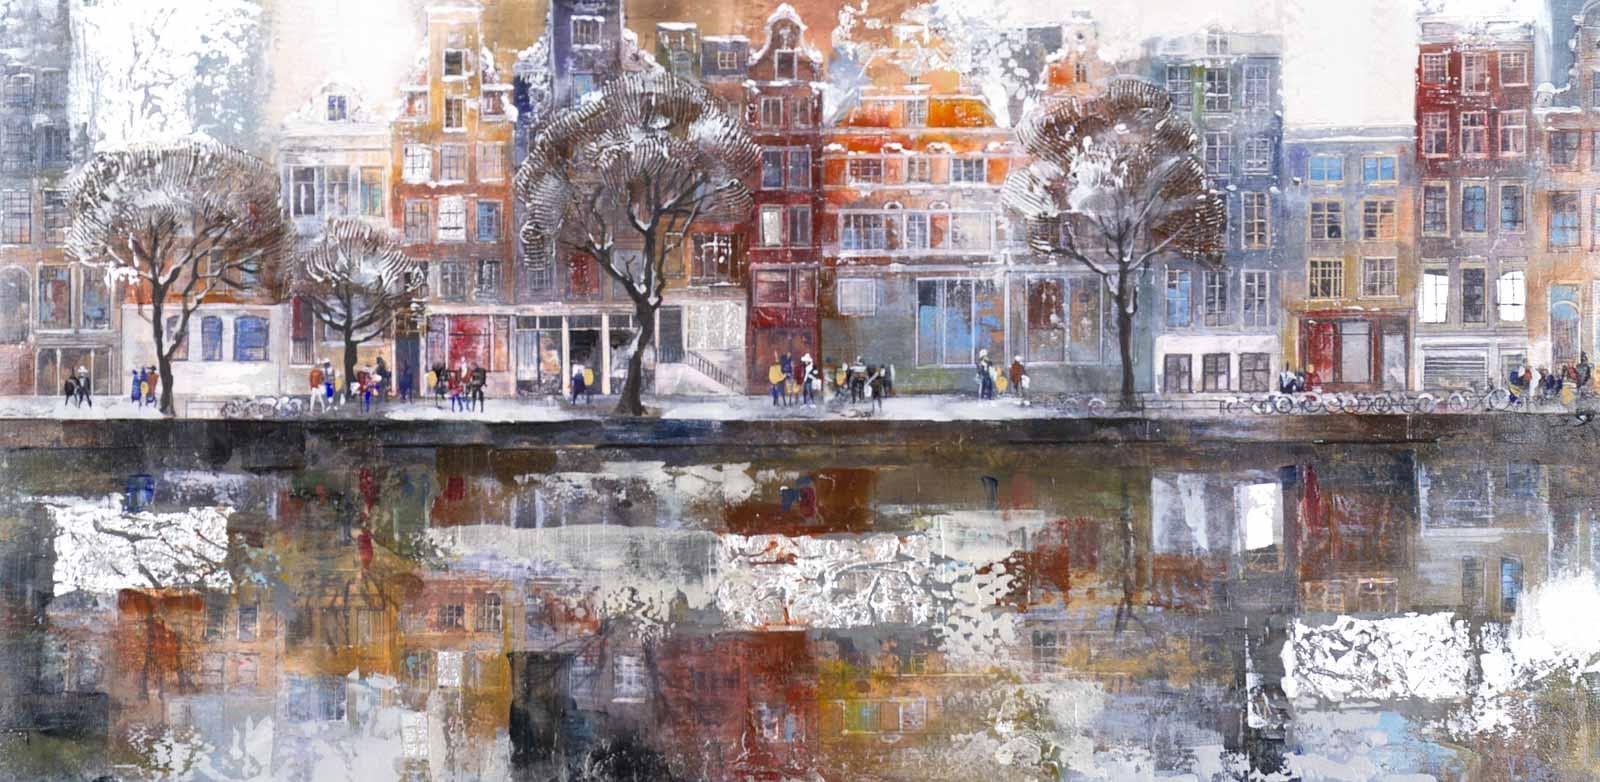 Winter Reflections, Amsterdam